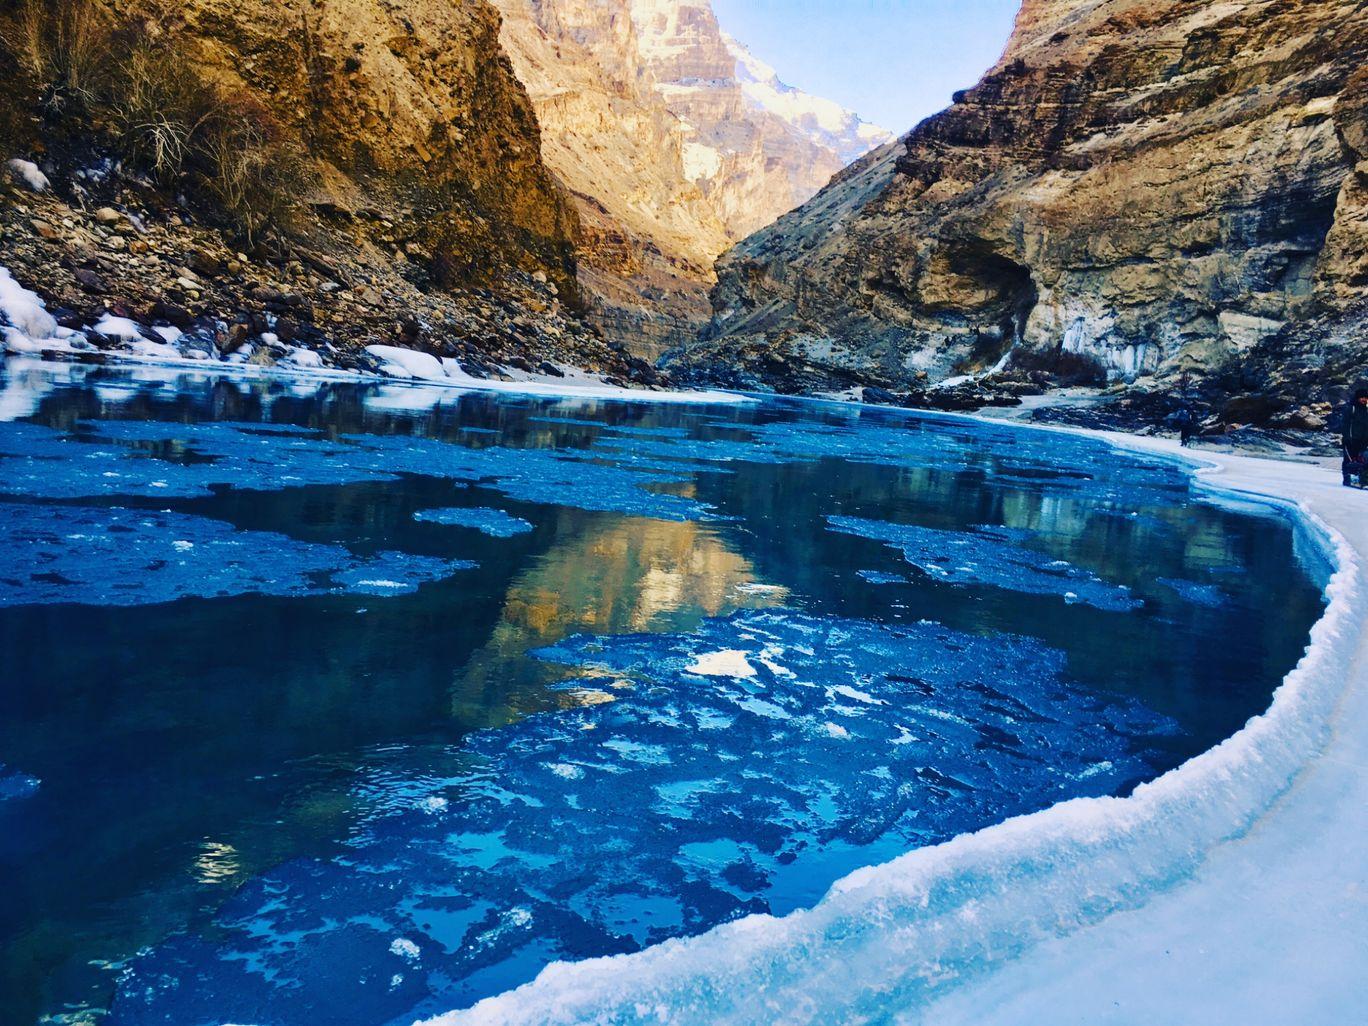 Photo of Chadar trek - Trekking In Ladakh - Frozen River Trekking In Ladakh By Nagaraj S